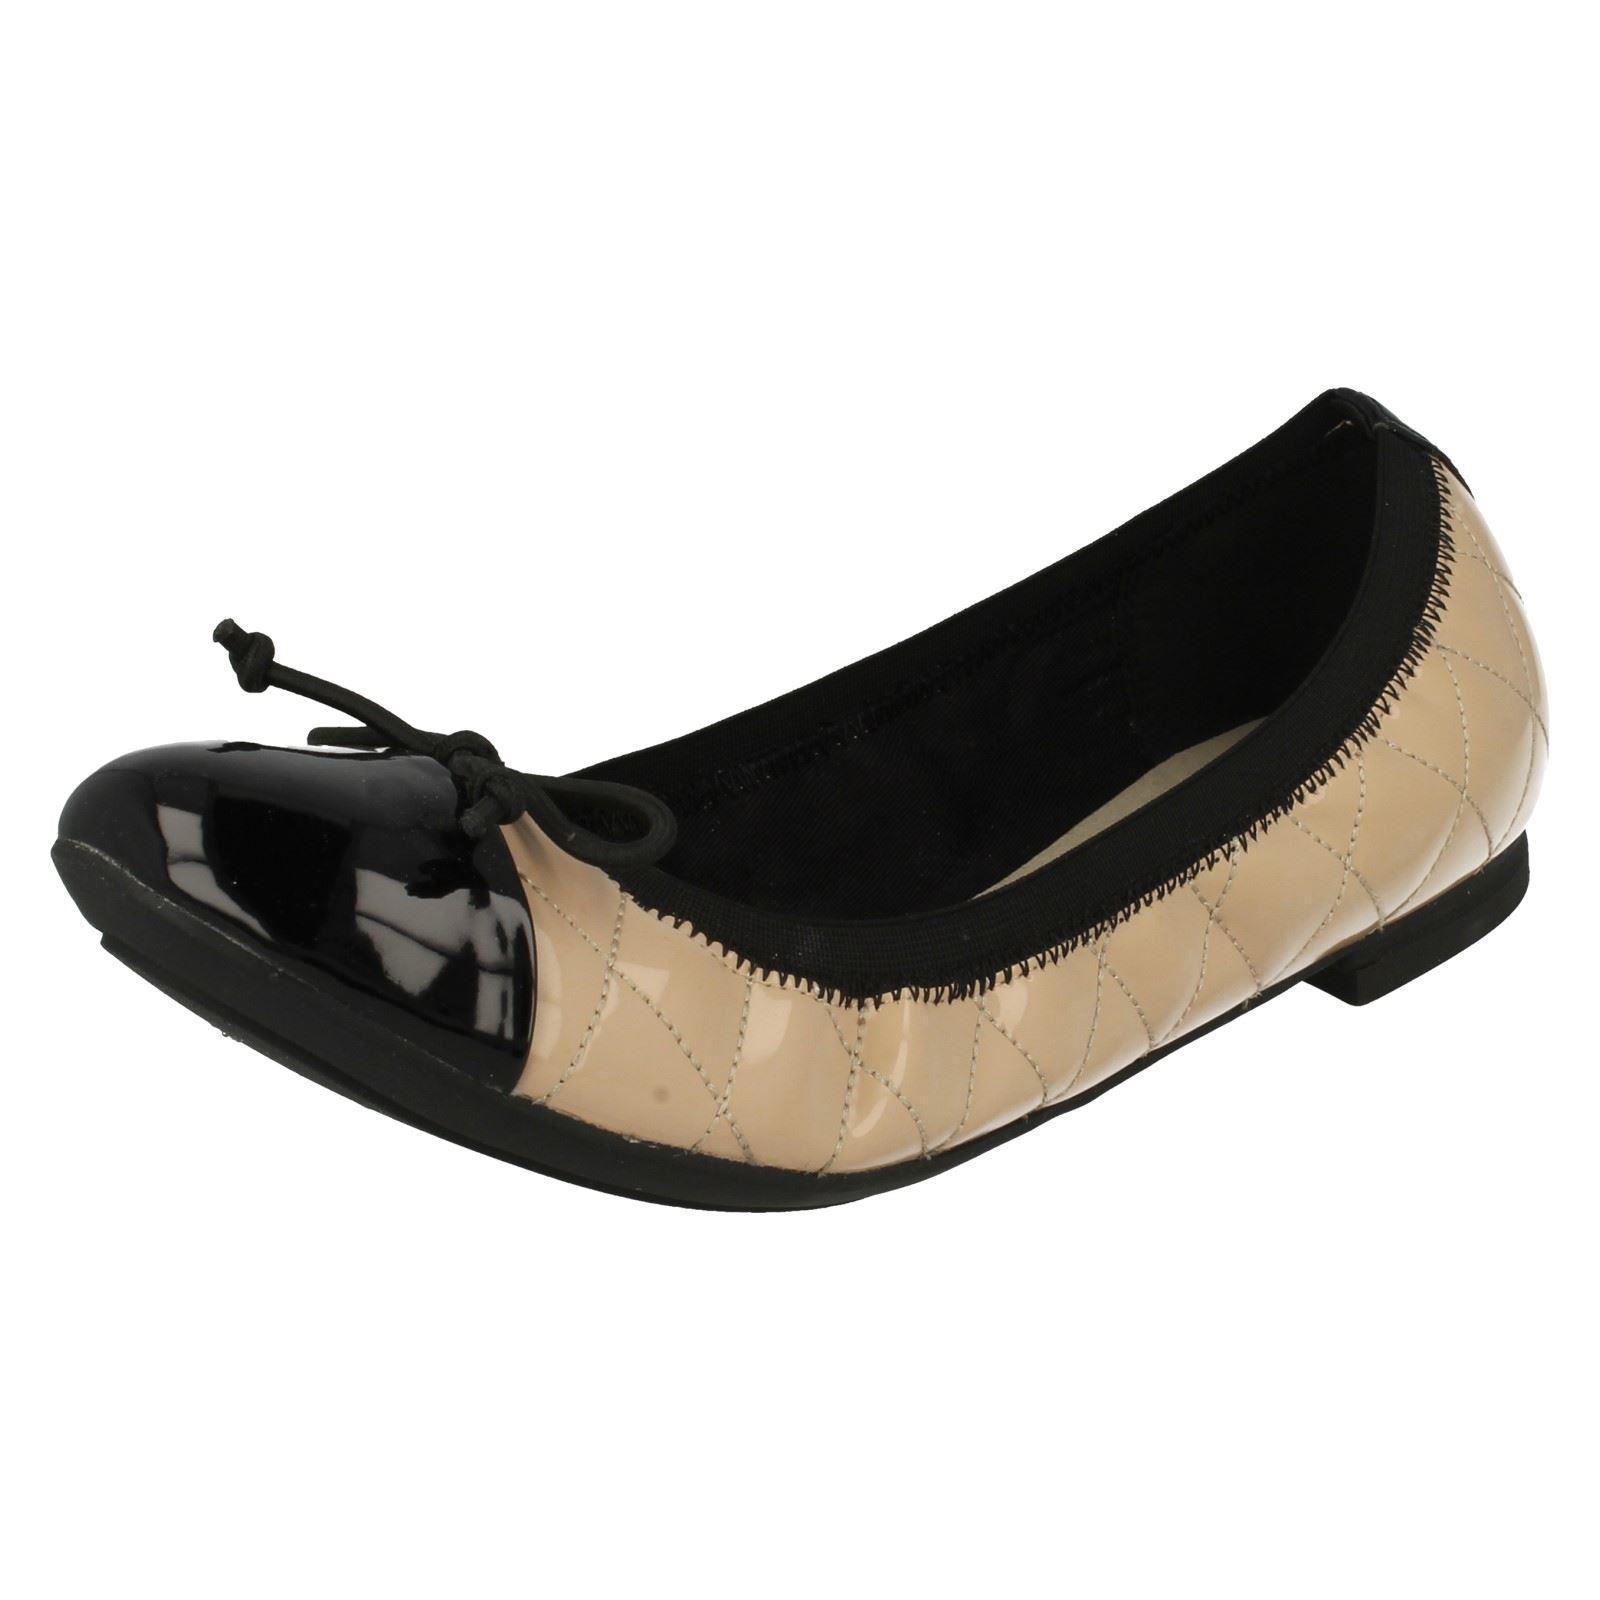 Elastacated Shoes Pumps Ballerina Flat Ladies Clarks Label x0qn5w40Ff